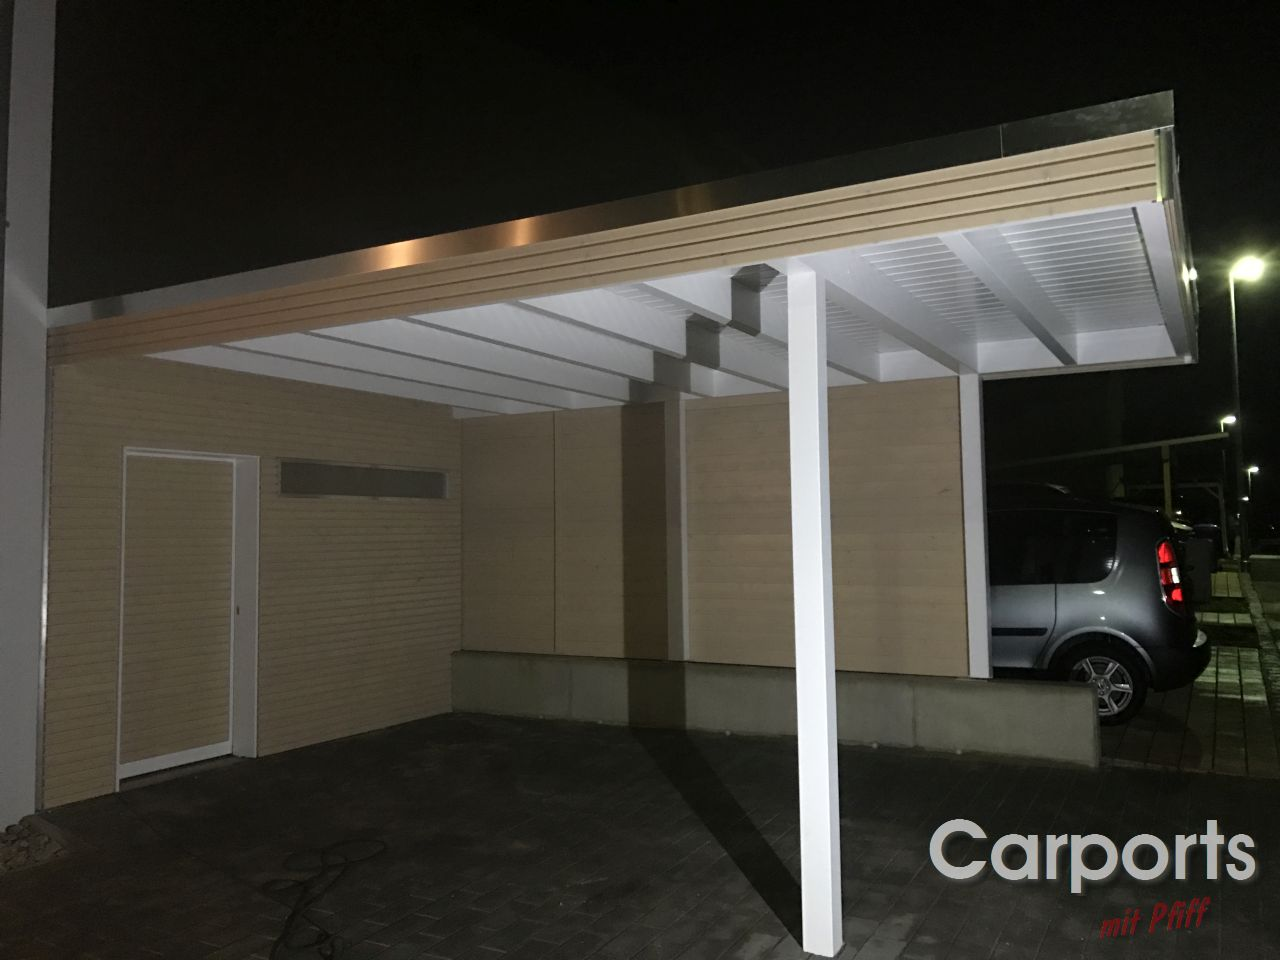 carport bauhaus rhombo carports mit pfiff carports mit pfiff. Black Bedroom Furniture Sets. Home Design Ideas